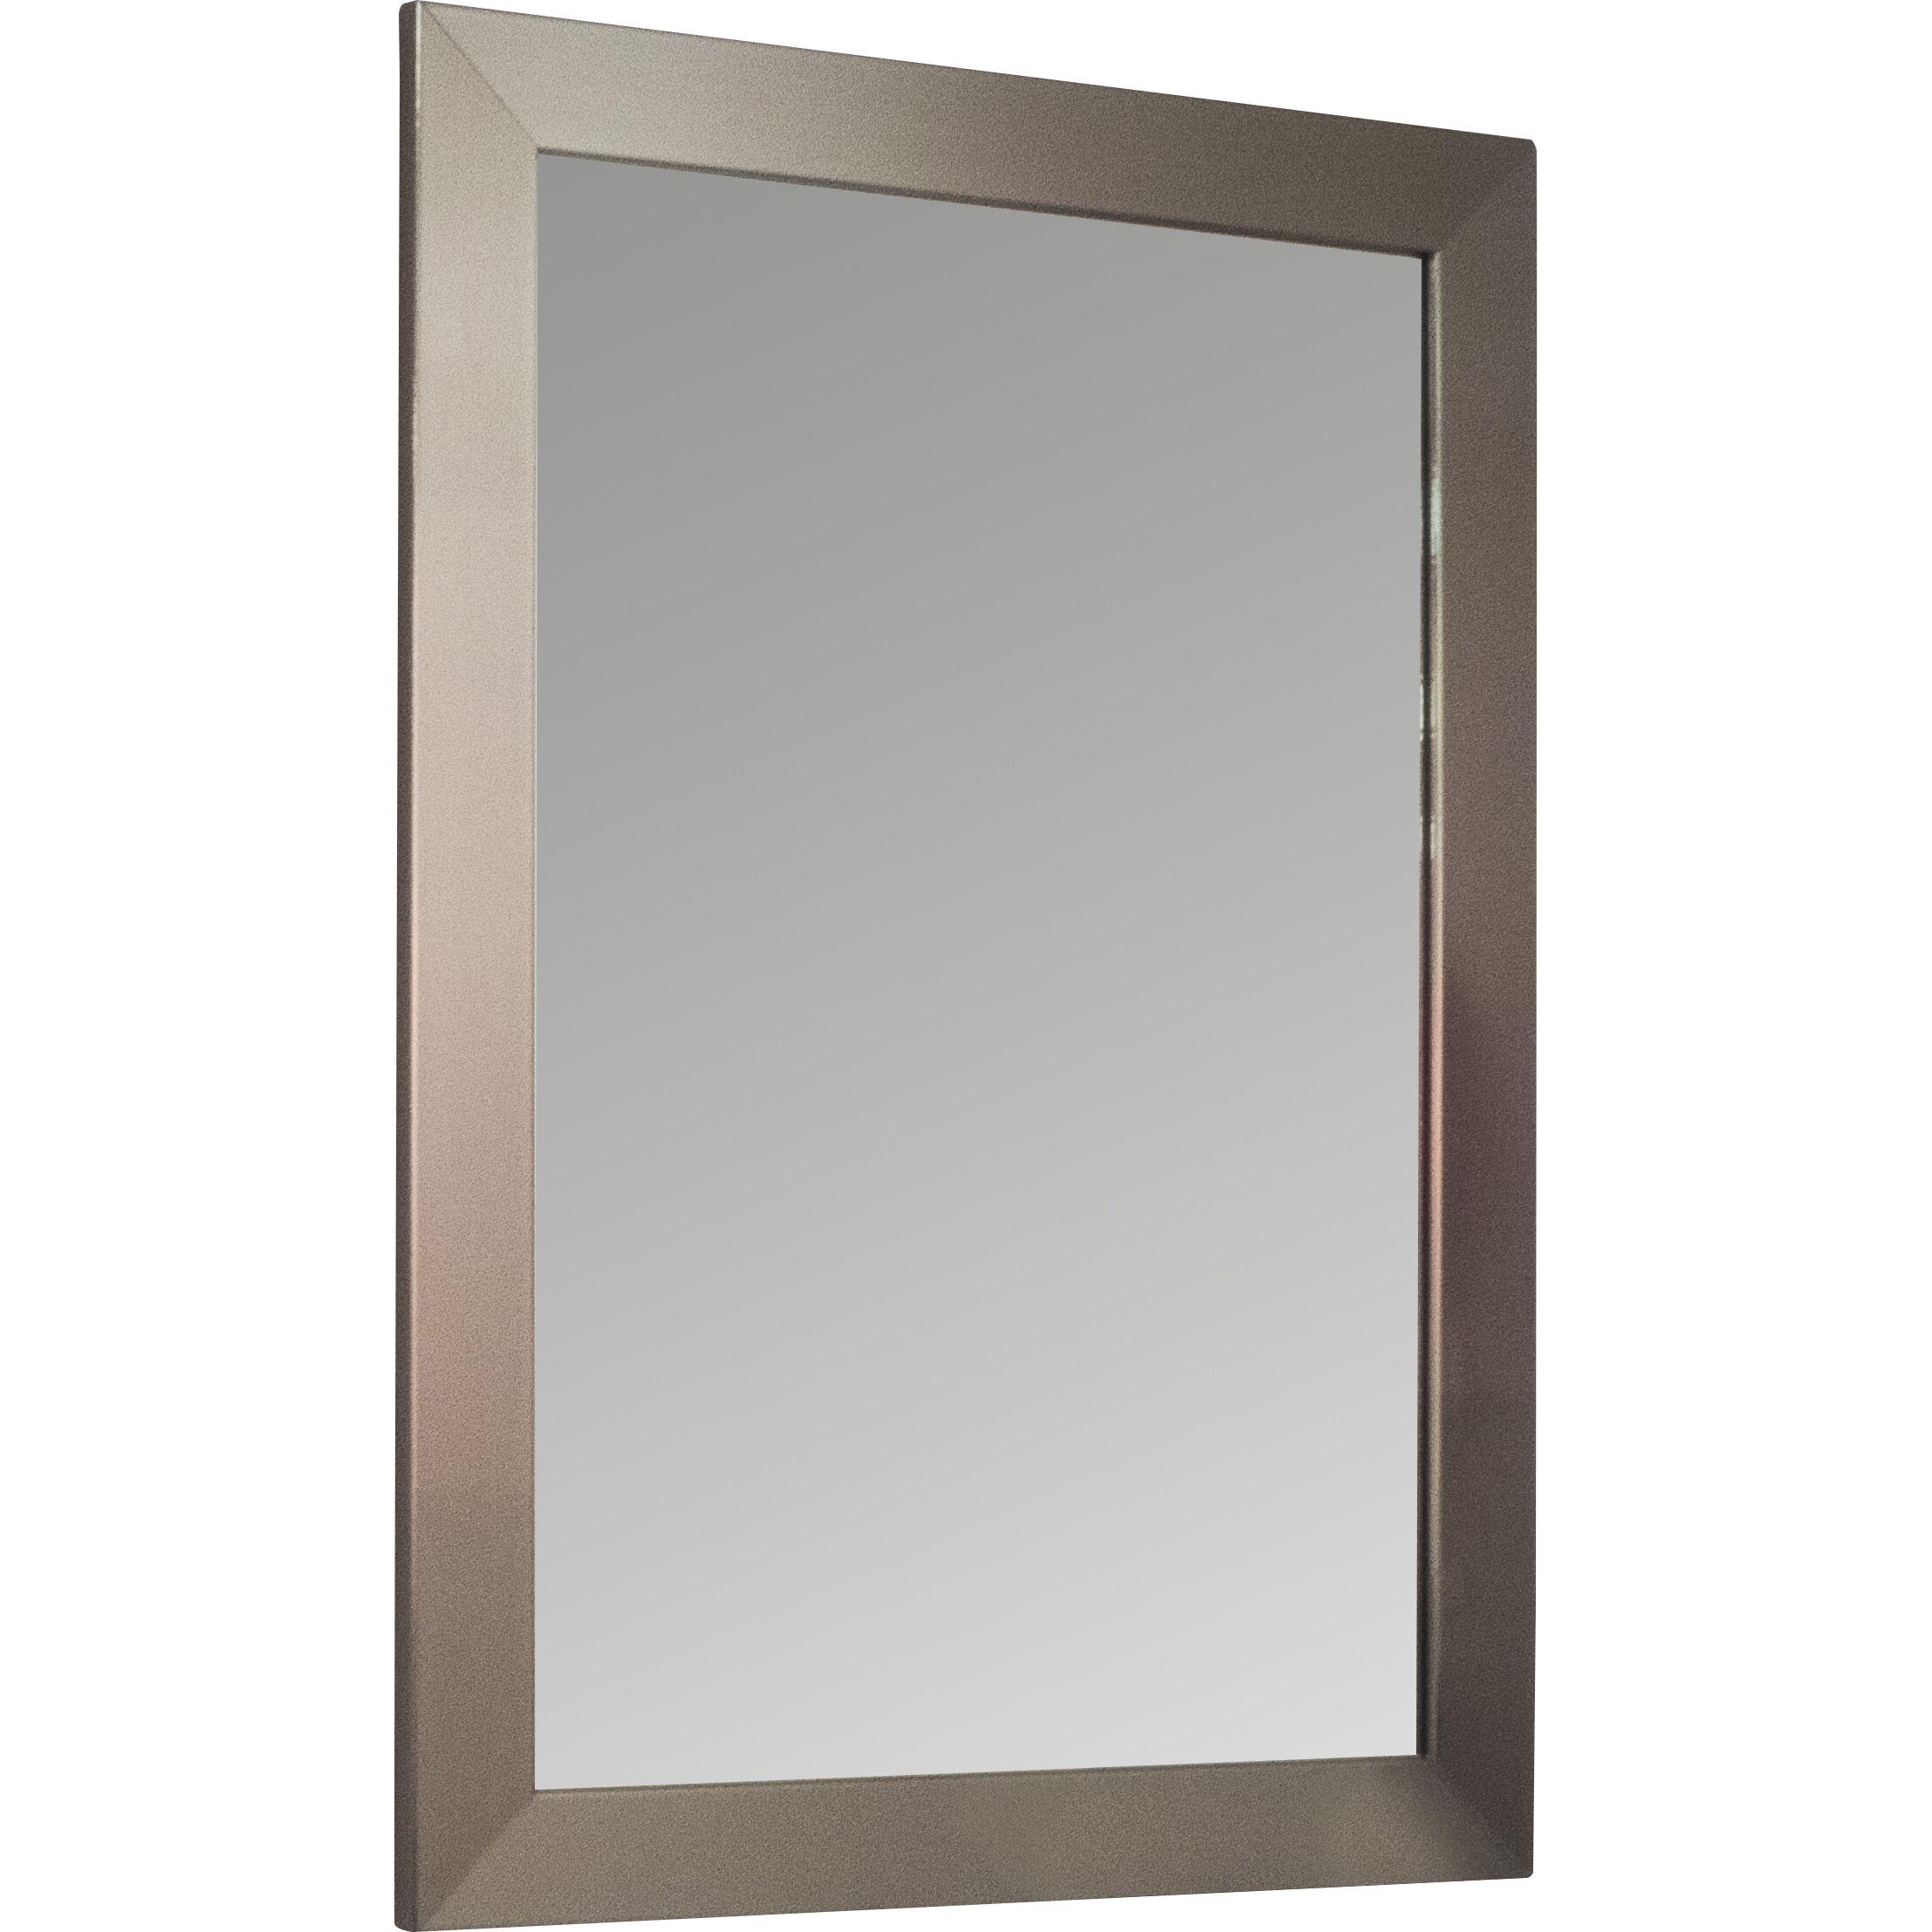 House of hampton beveled wall mirror reviews wayfair for Beveled wall mirror